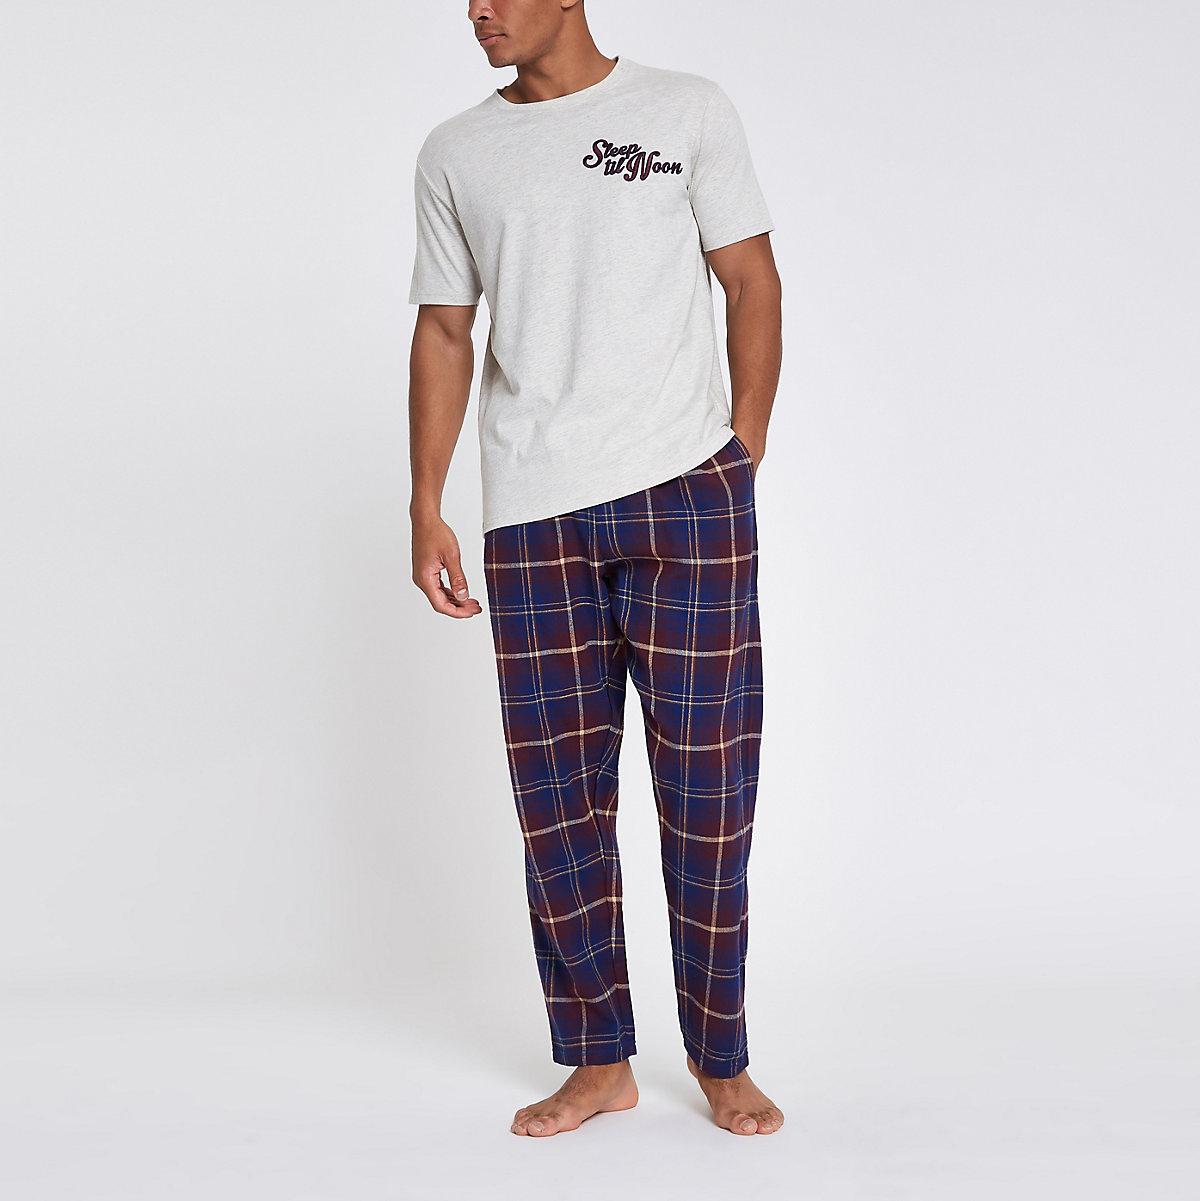 Grey 'sleep til noon' tartan check pyjama set